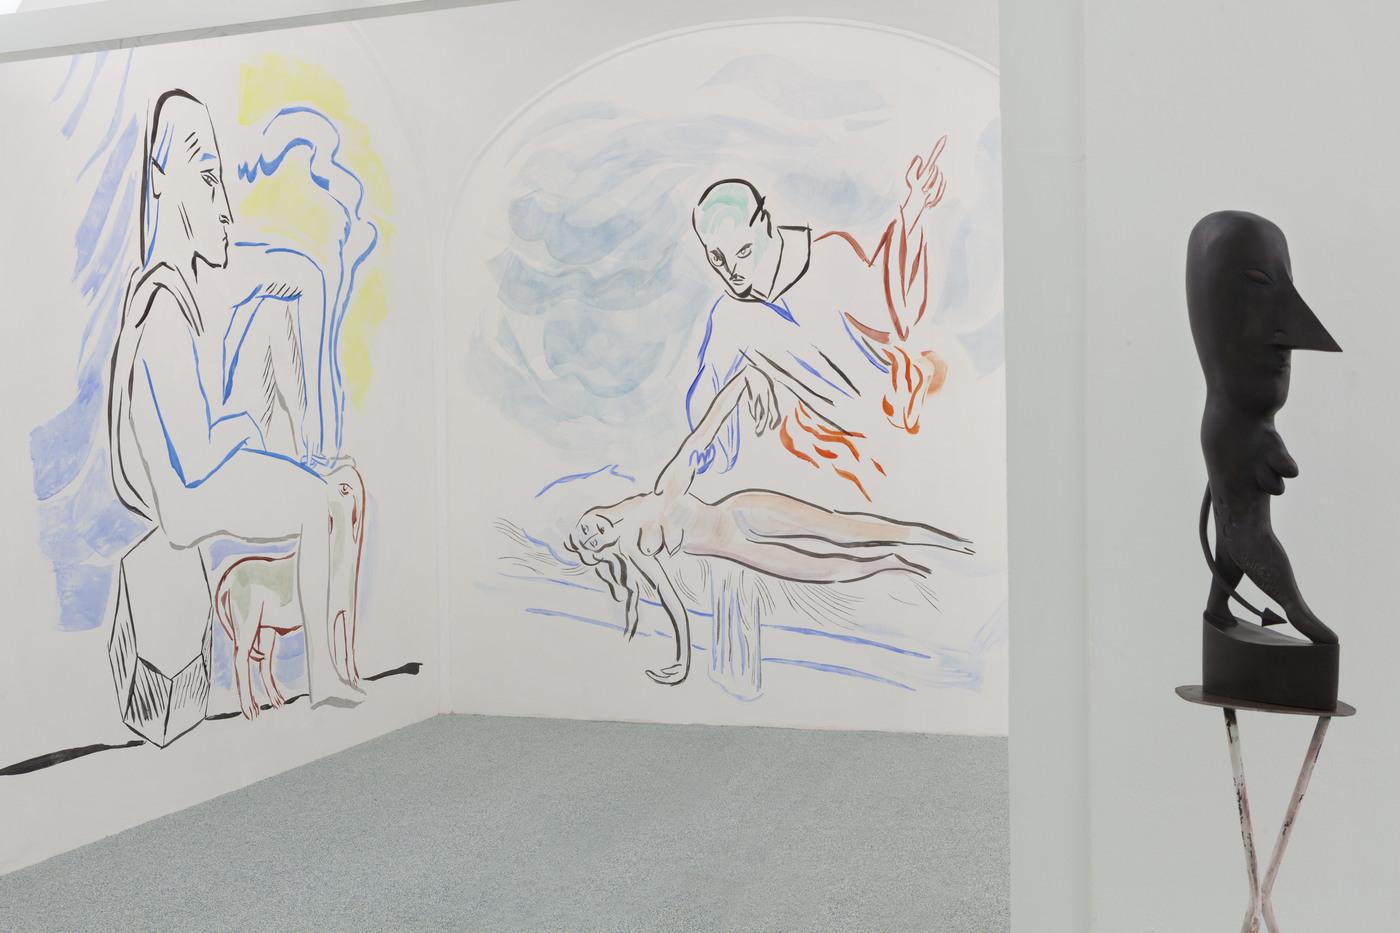 17. Camille Henrot, Monday. Installation view, Fondazione Memmo, Rome, 2016. jpg